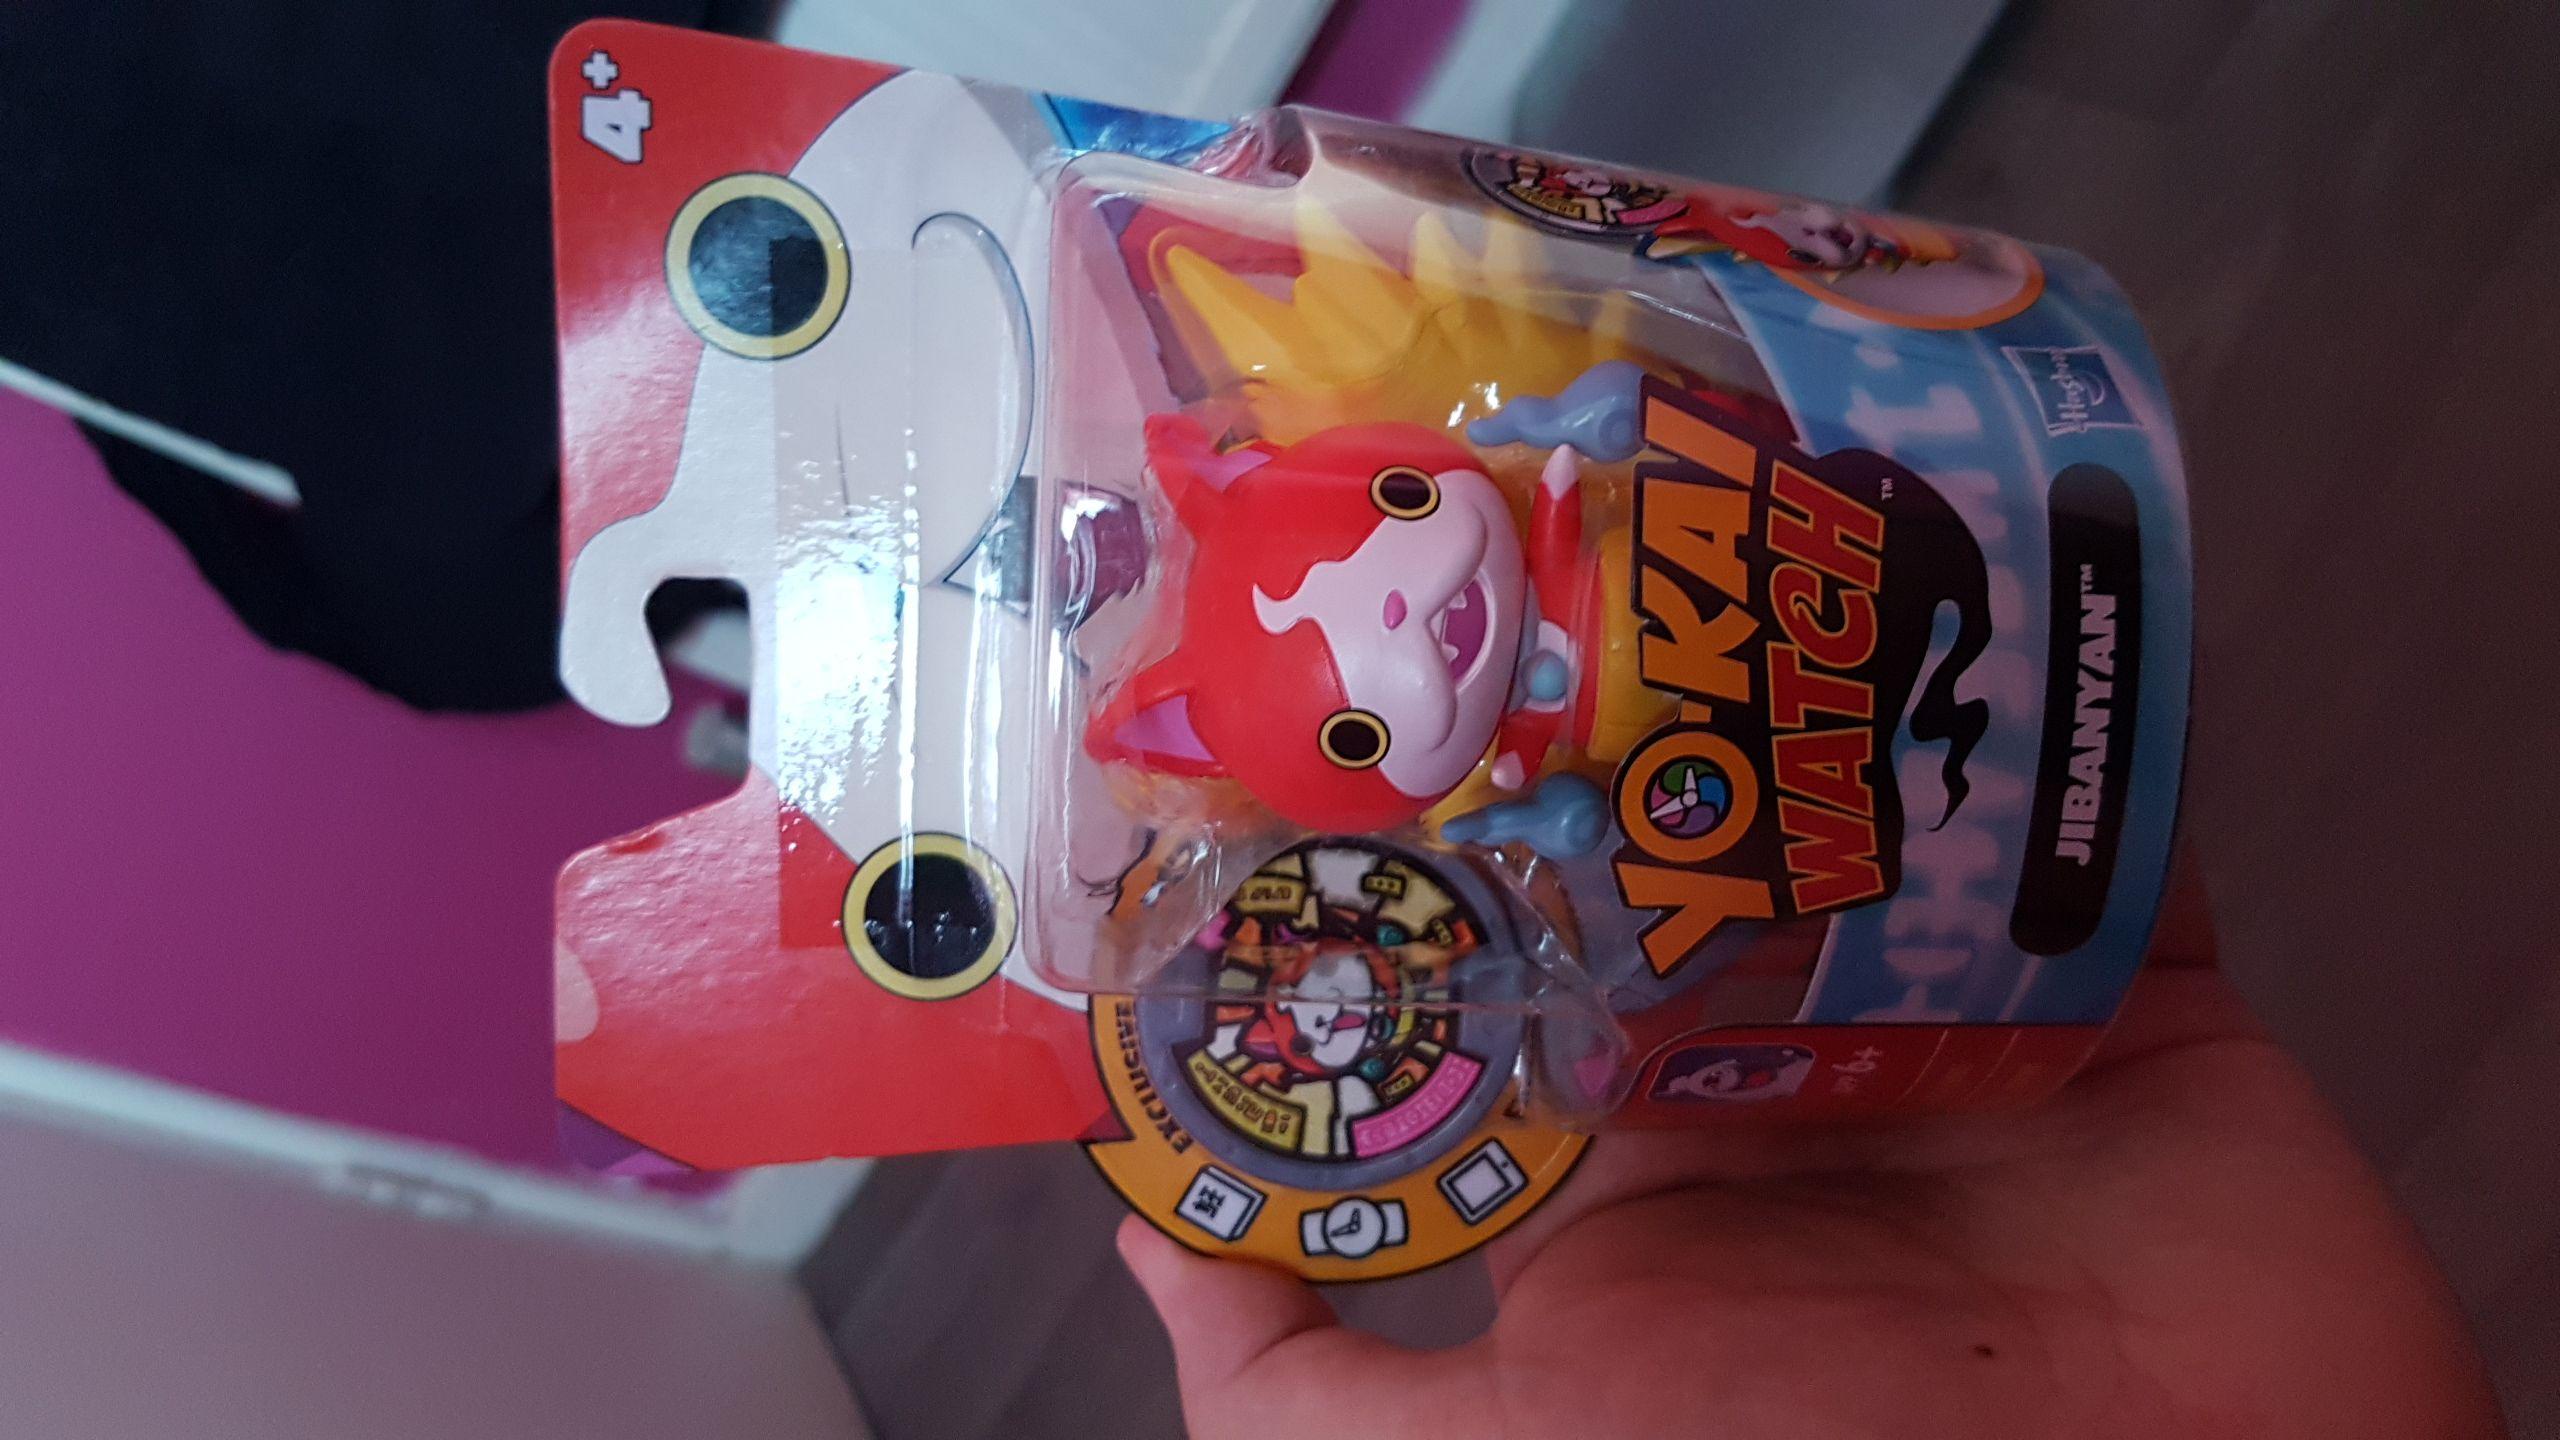 Yokai watch toy £1 in poundworld